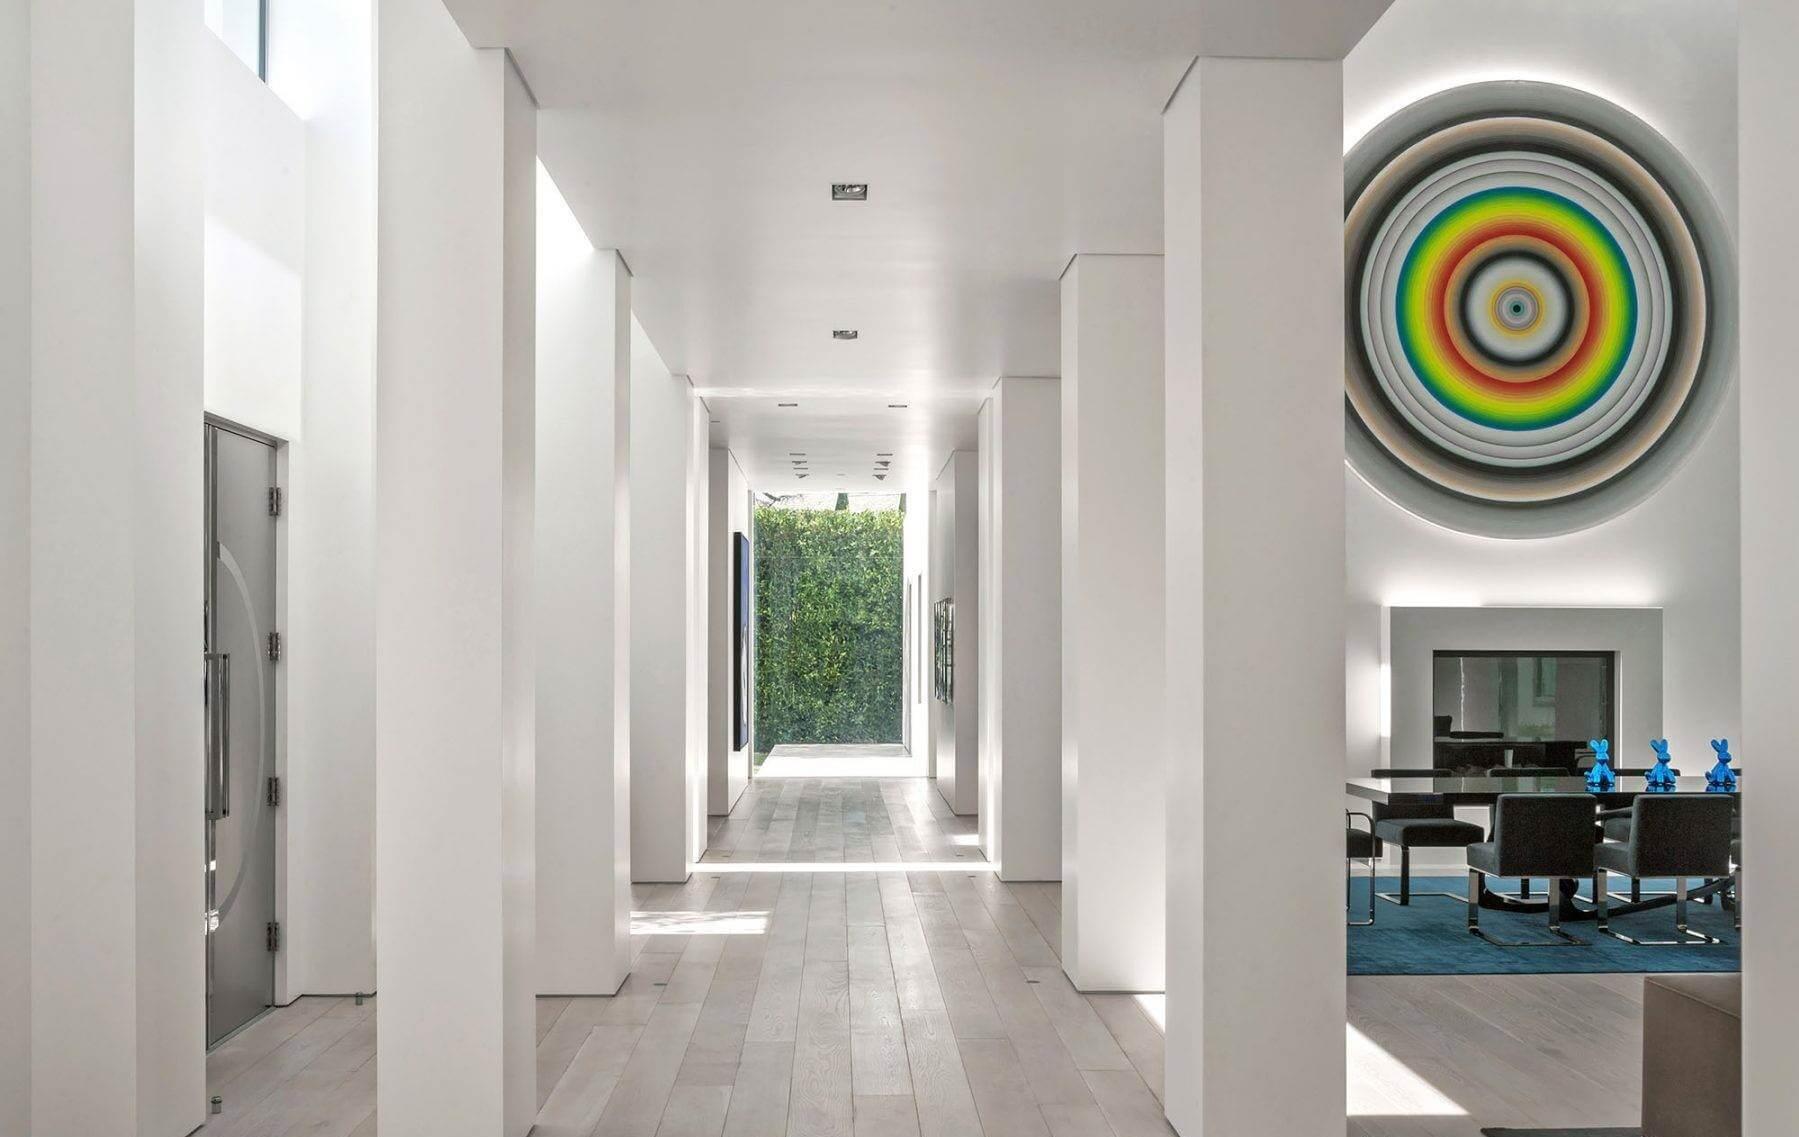 Hallway-Dining cropped